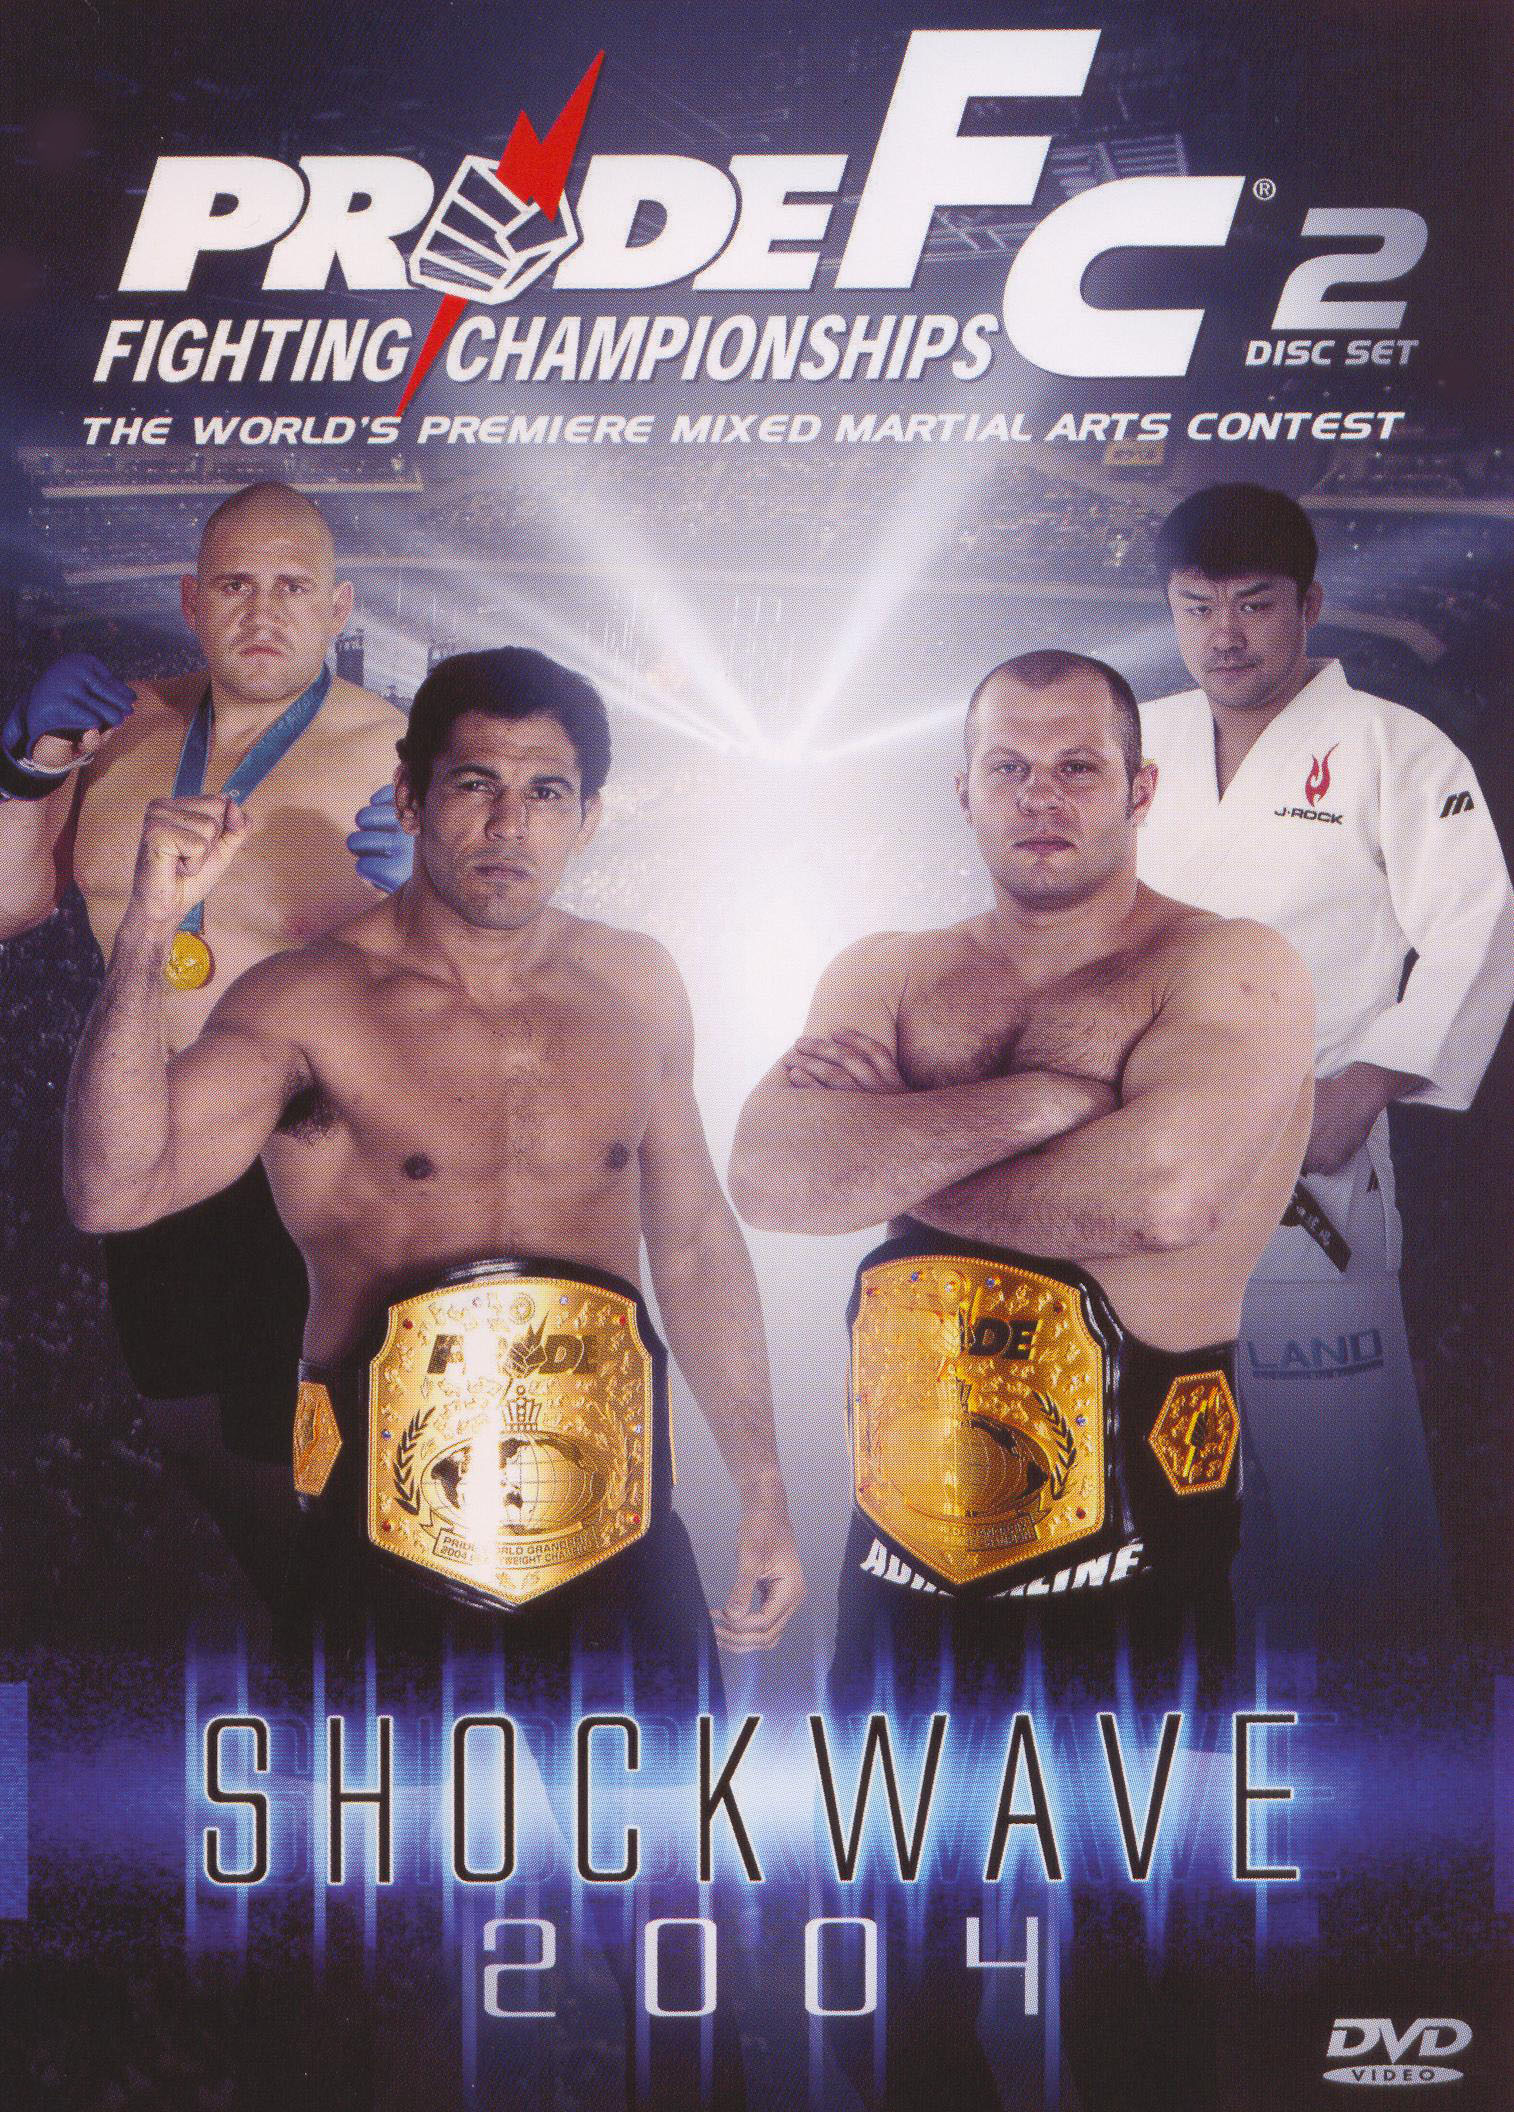 Fighting Championships: Shock Wave 2004